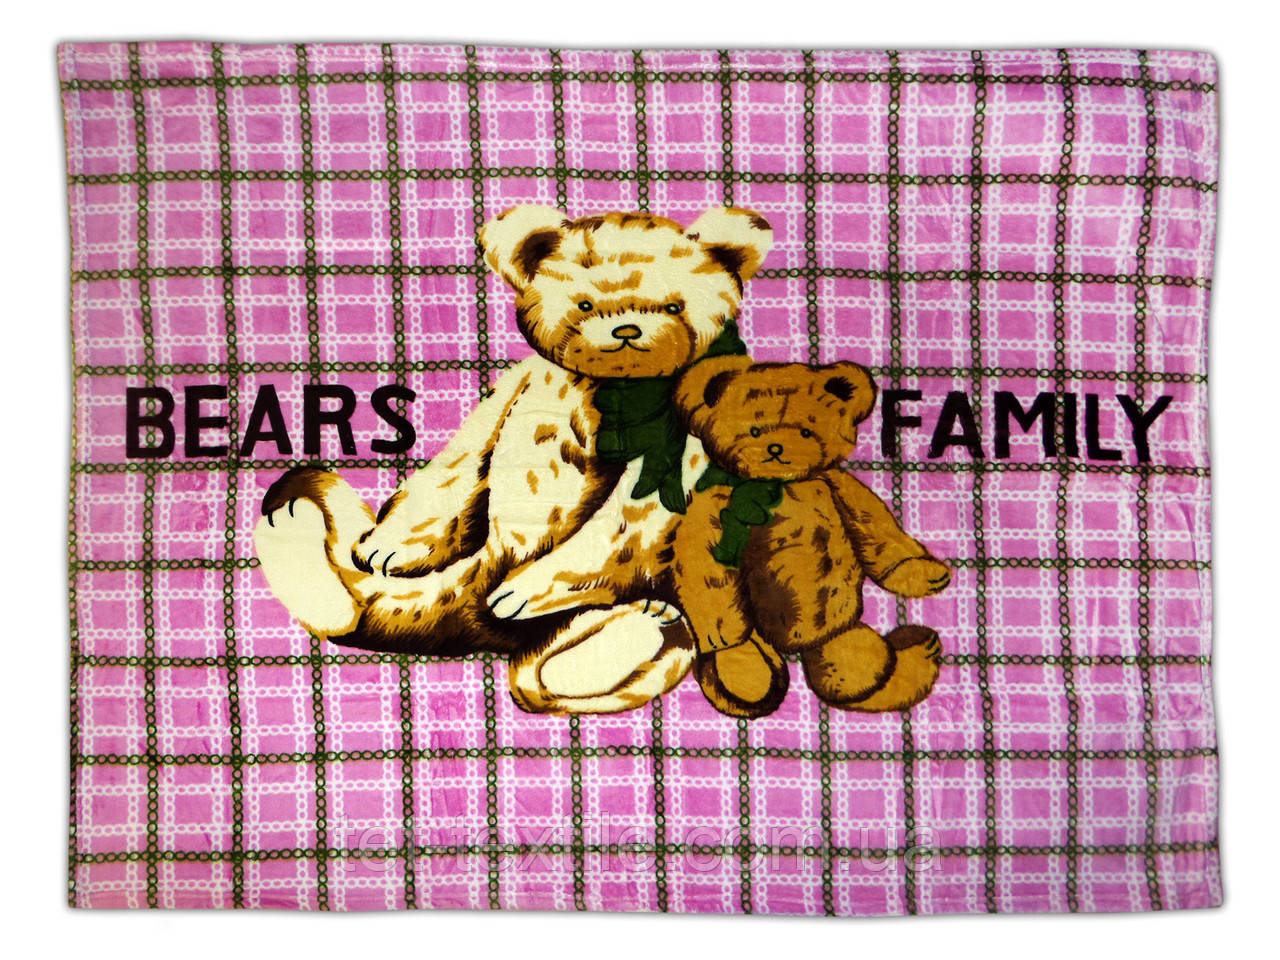 "Плед детский из микрофибры ""Bears family"" розовый (110х140)"